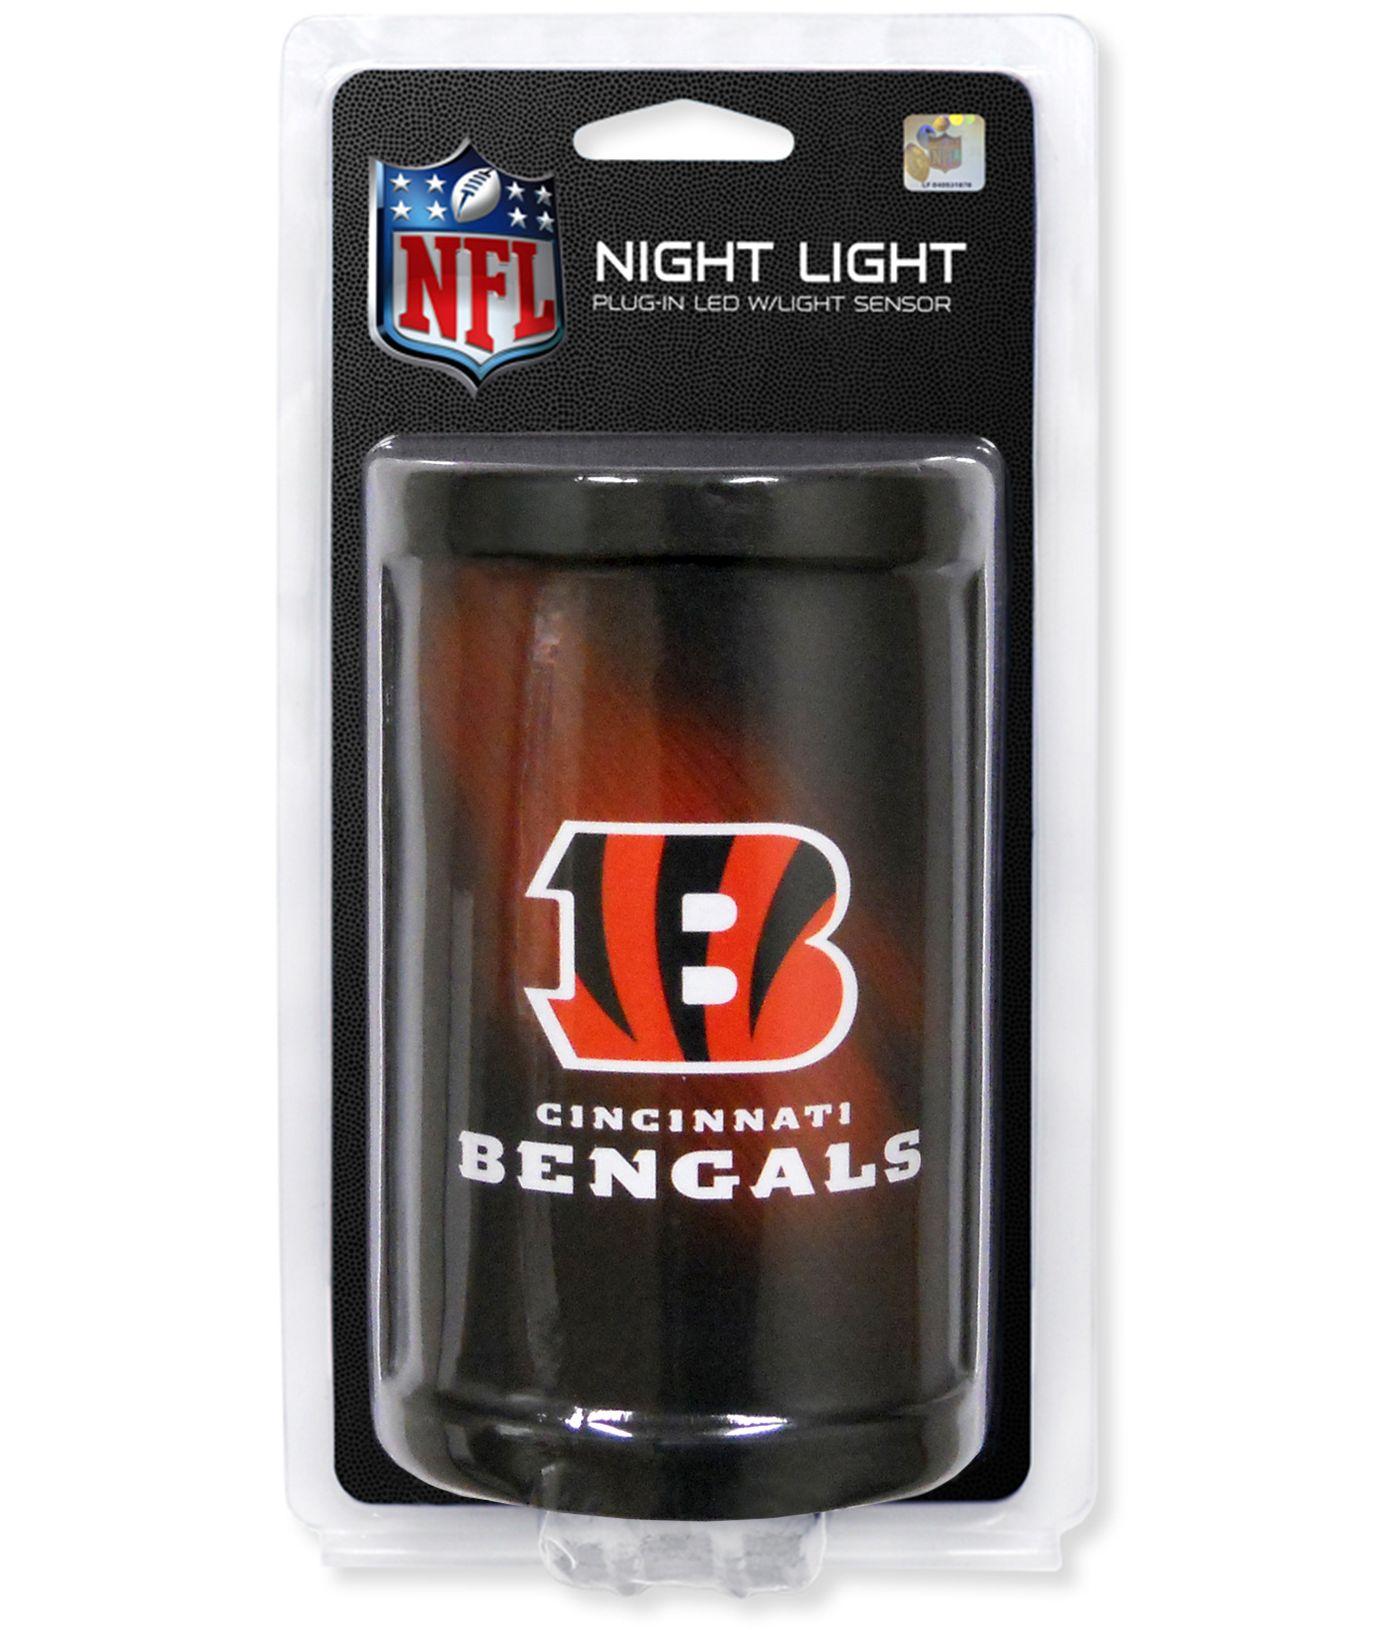 Party Animal Cincinnati Bengals Night Light